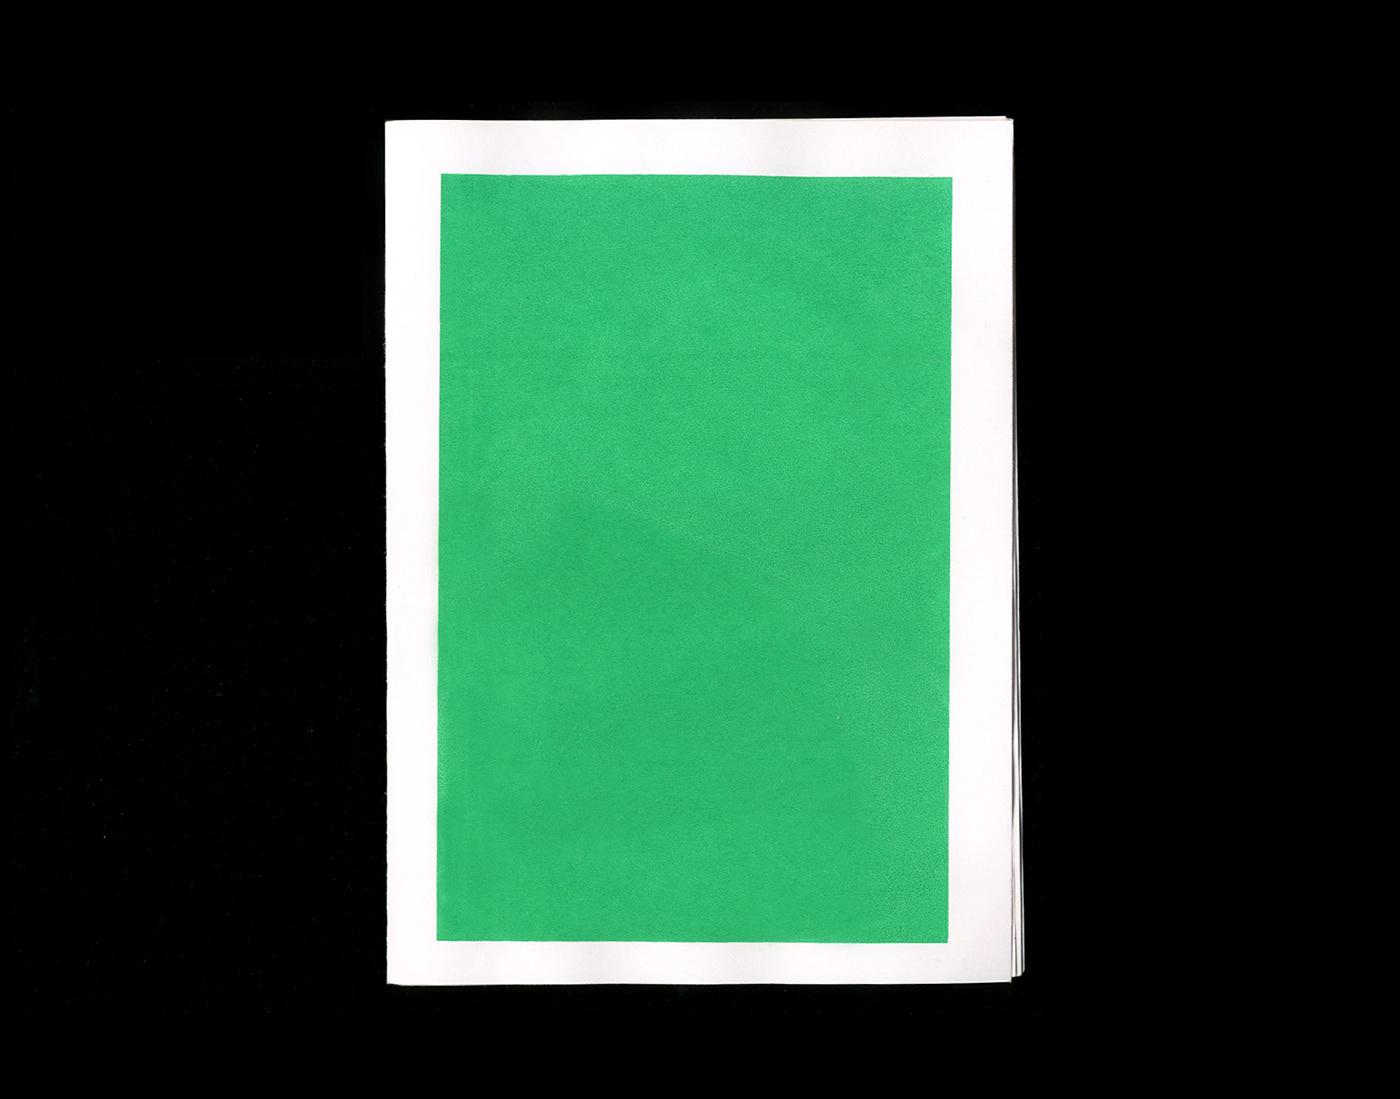 art color blocking edition graphic design  ILLUSTRATION  Zine  Screenprinting book colorblocking pamphlet